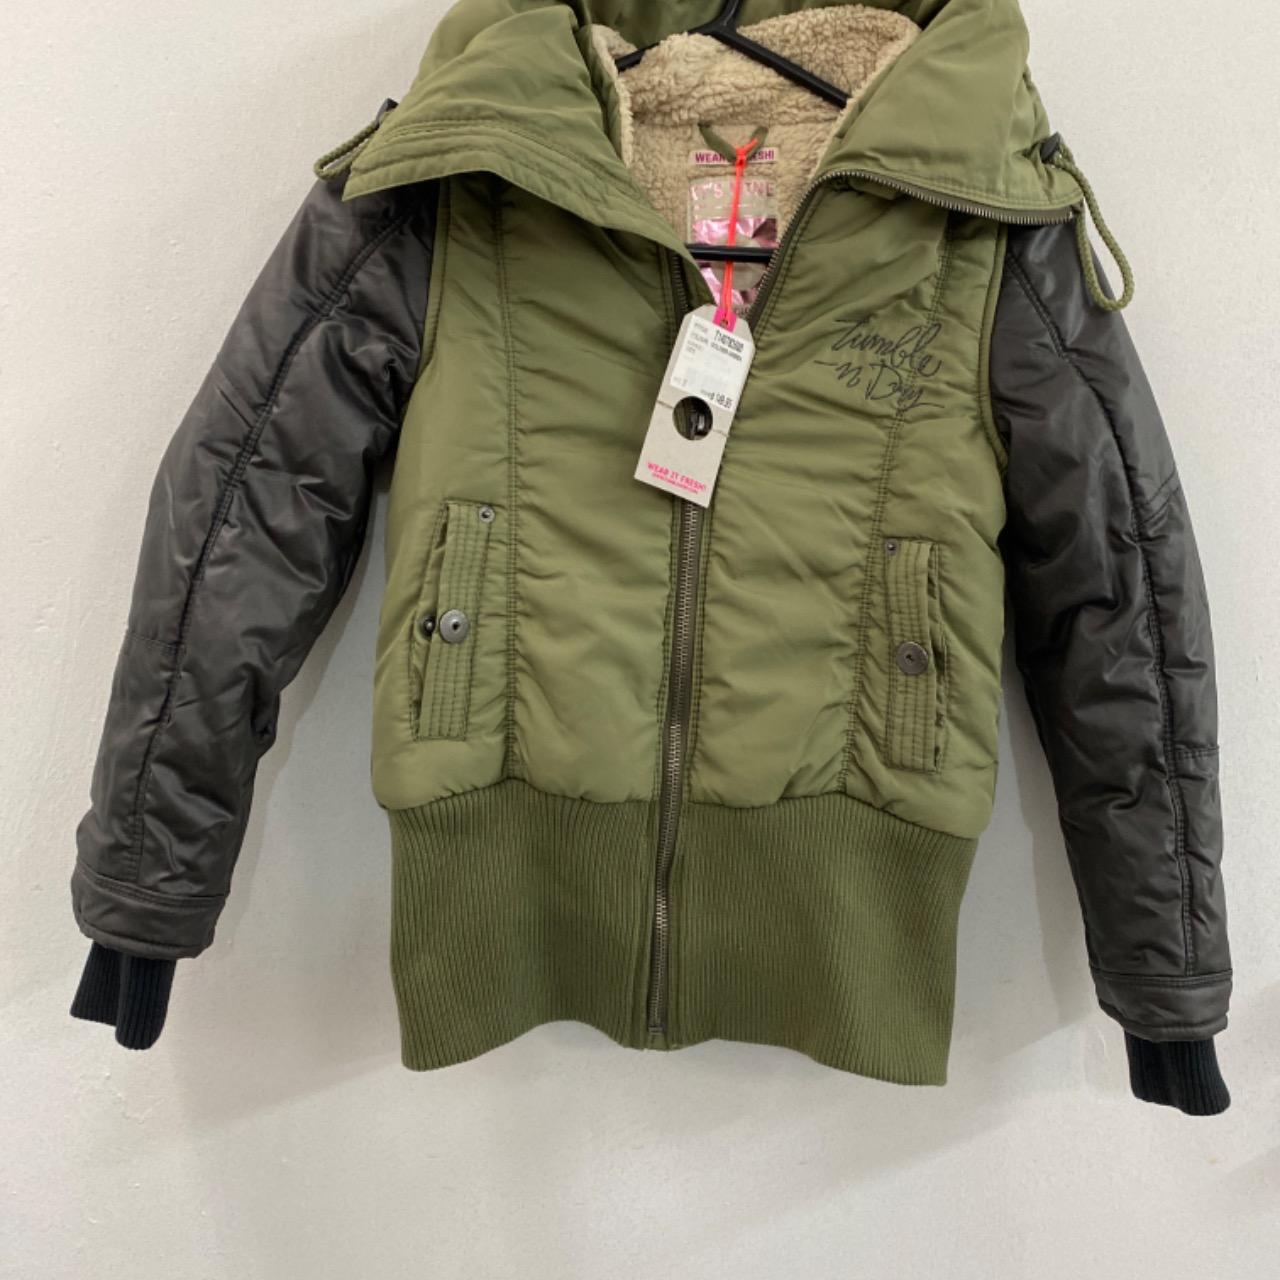 Kids  Size 10 Jackets